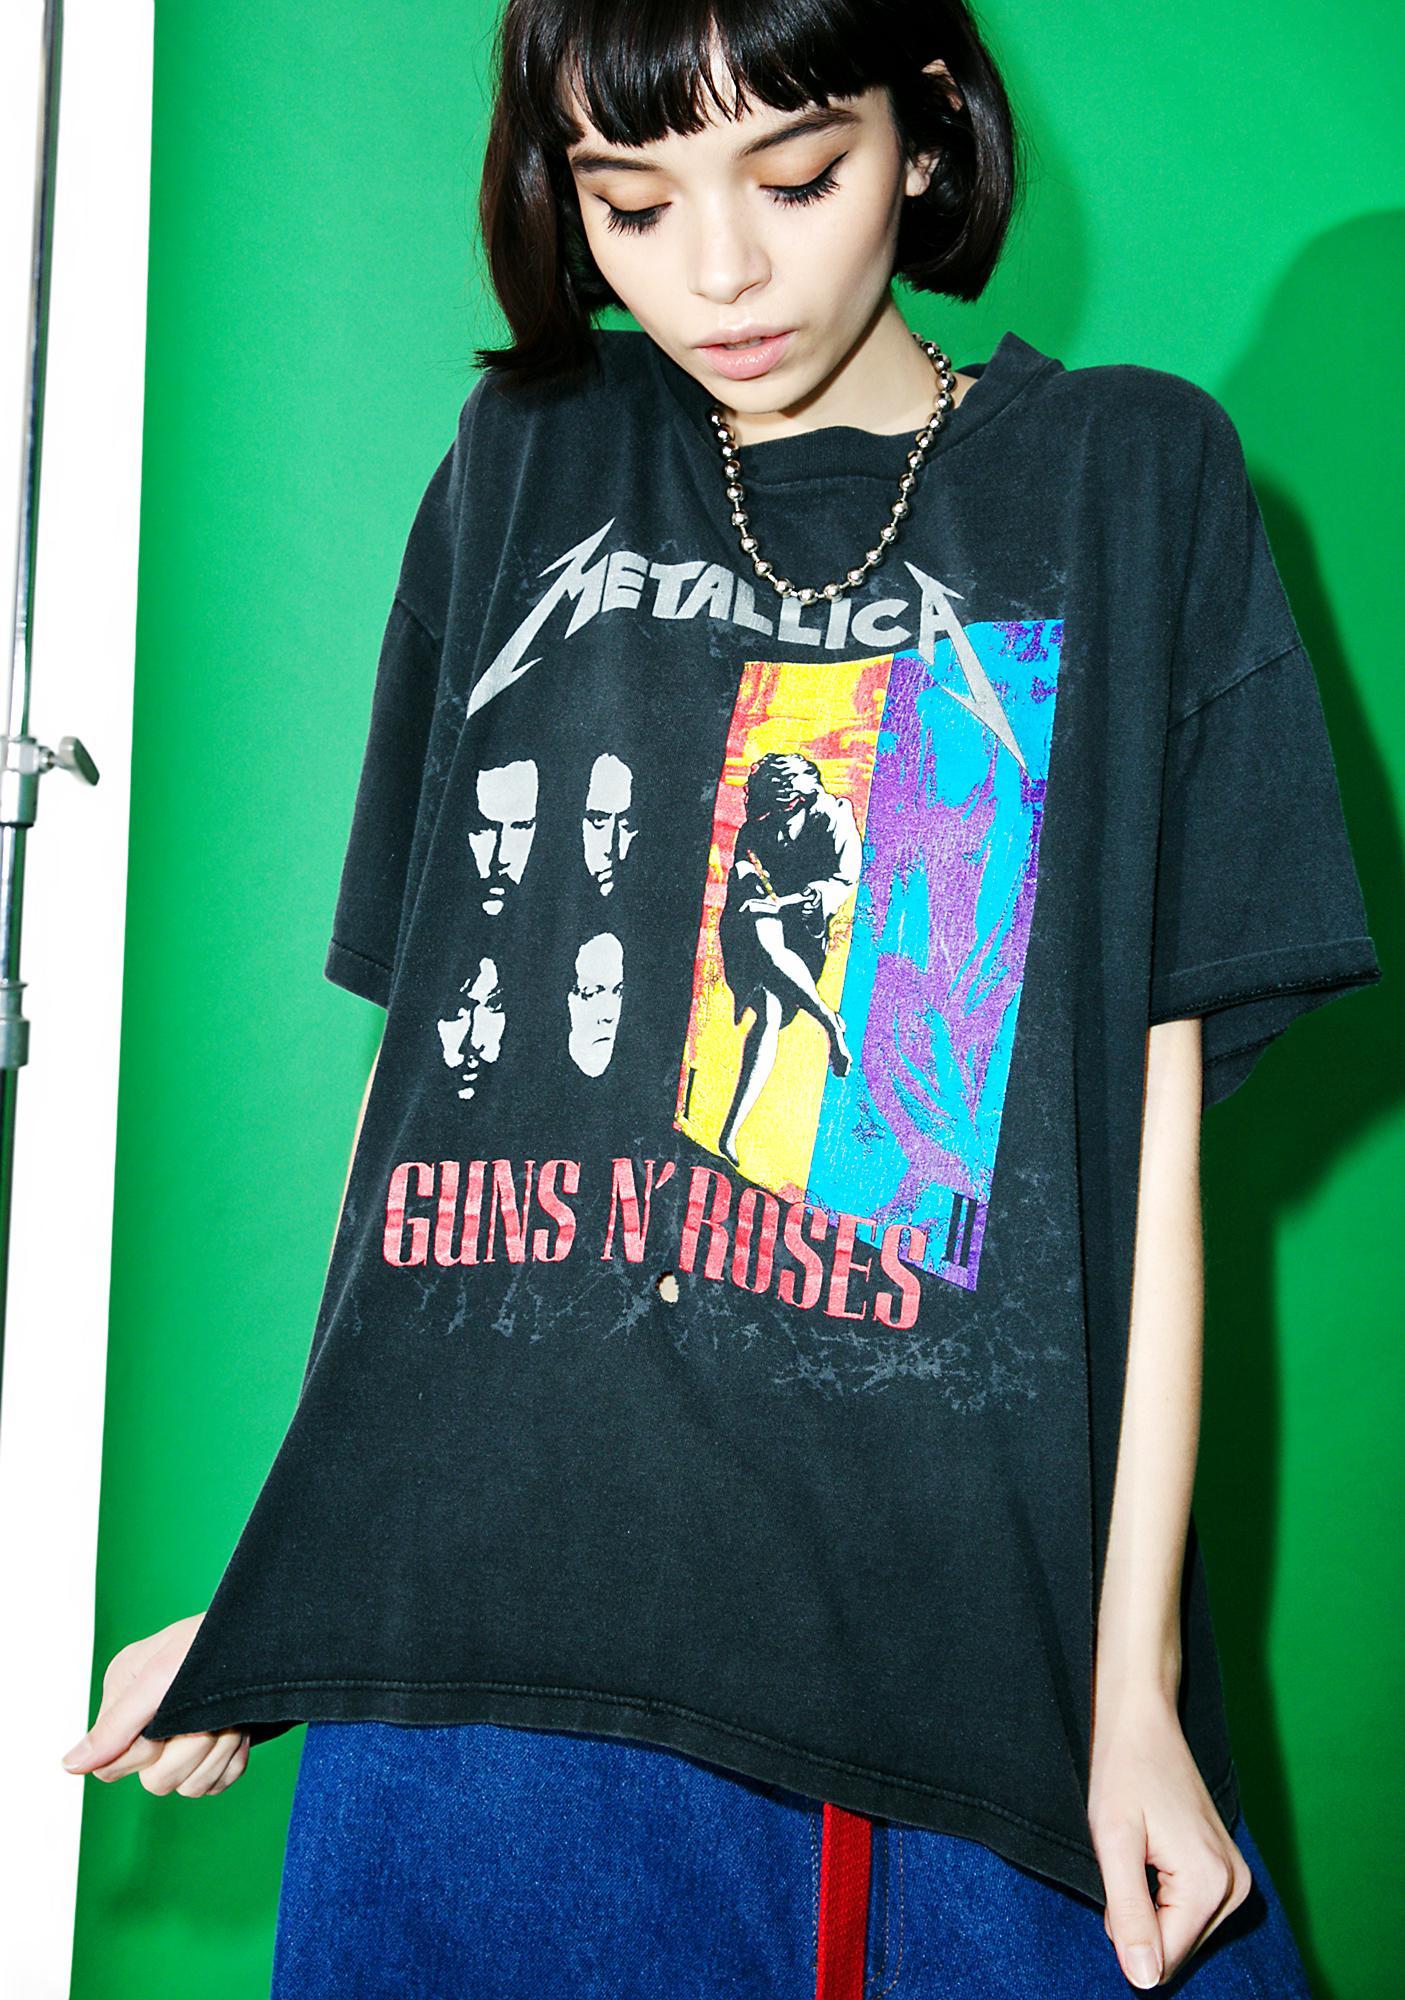 Vintage Metallica X Guns N' Roses '92 Tour Tee